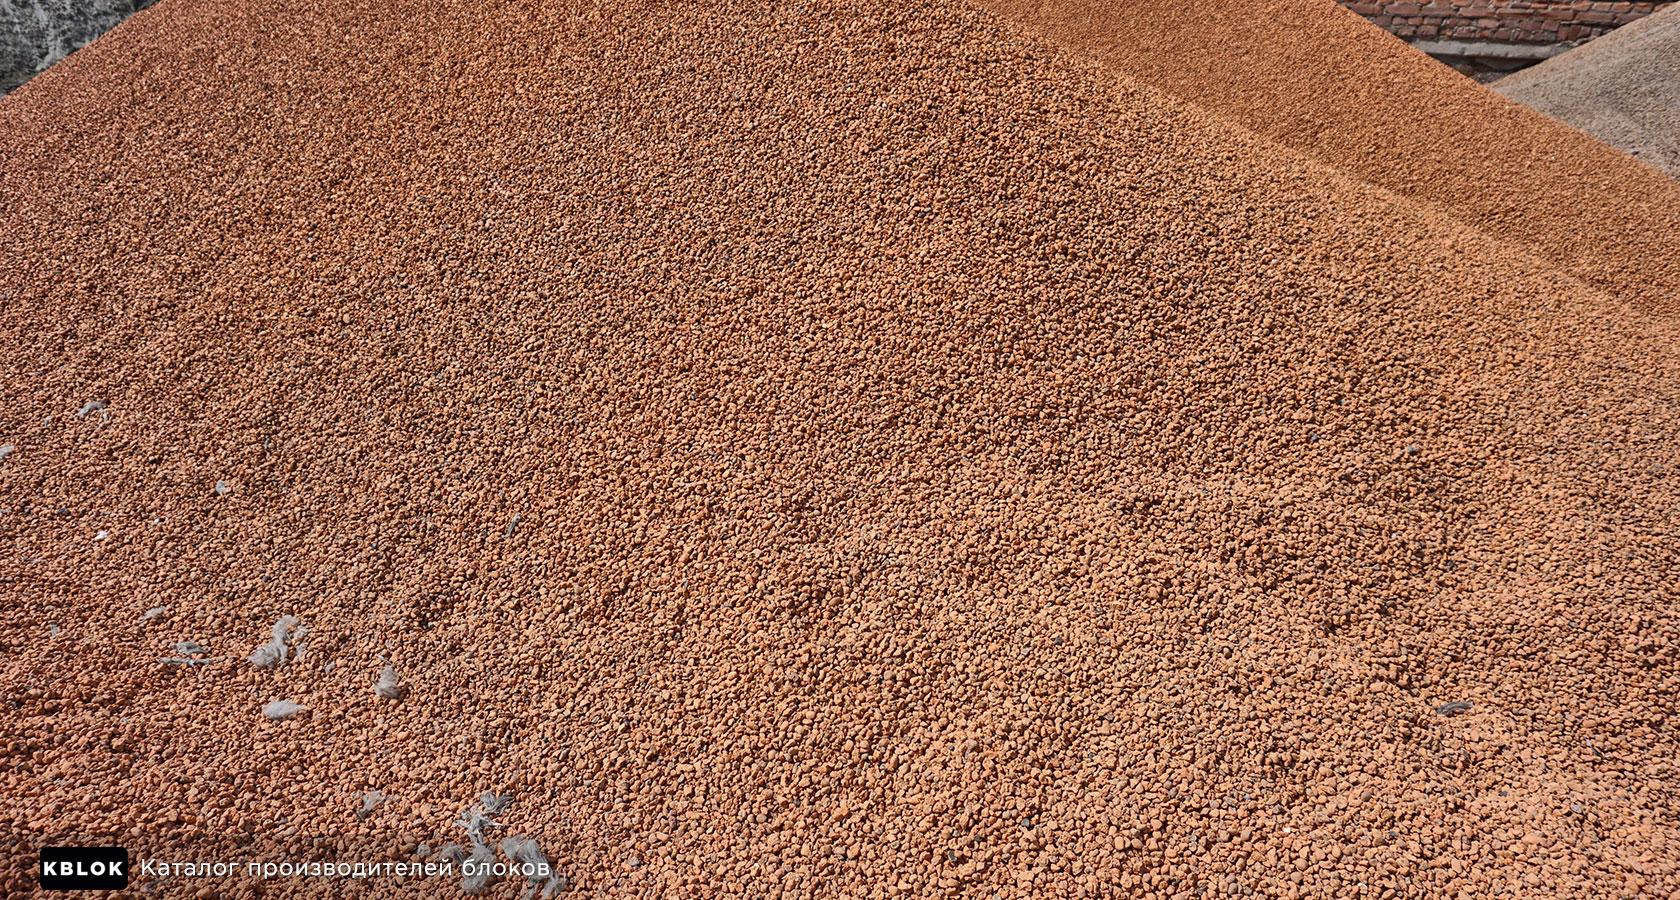 запасы керамзита на производстве блоков